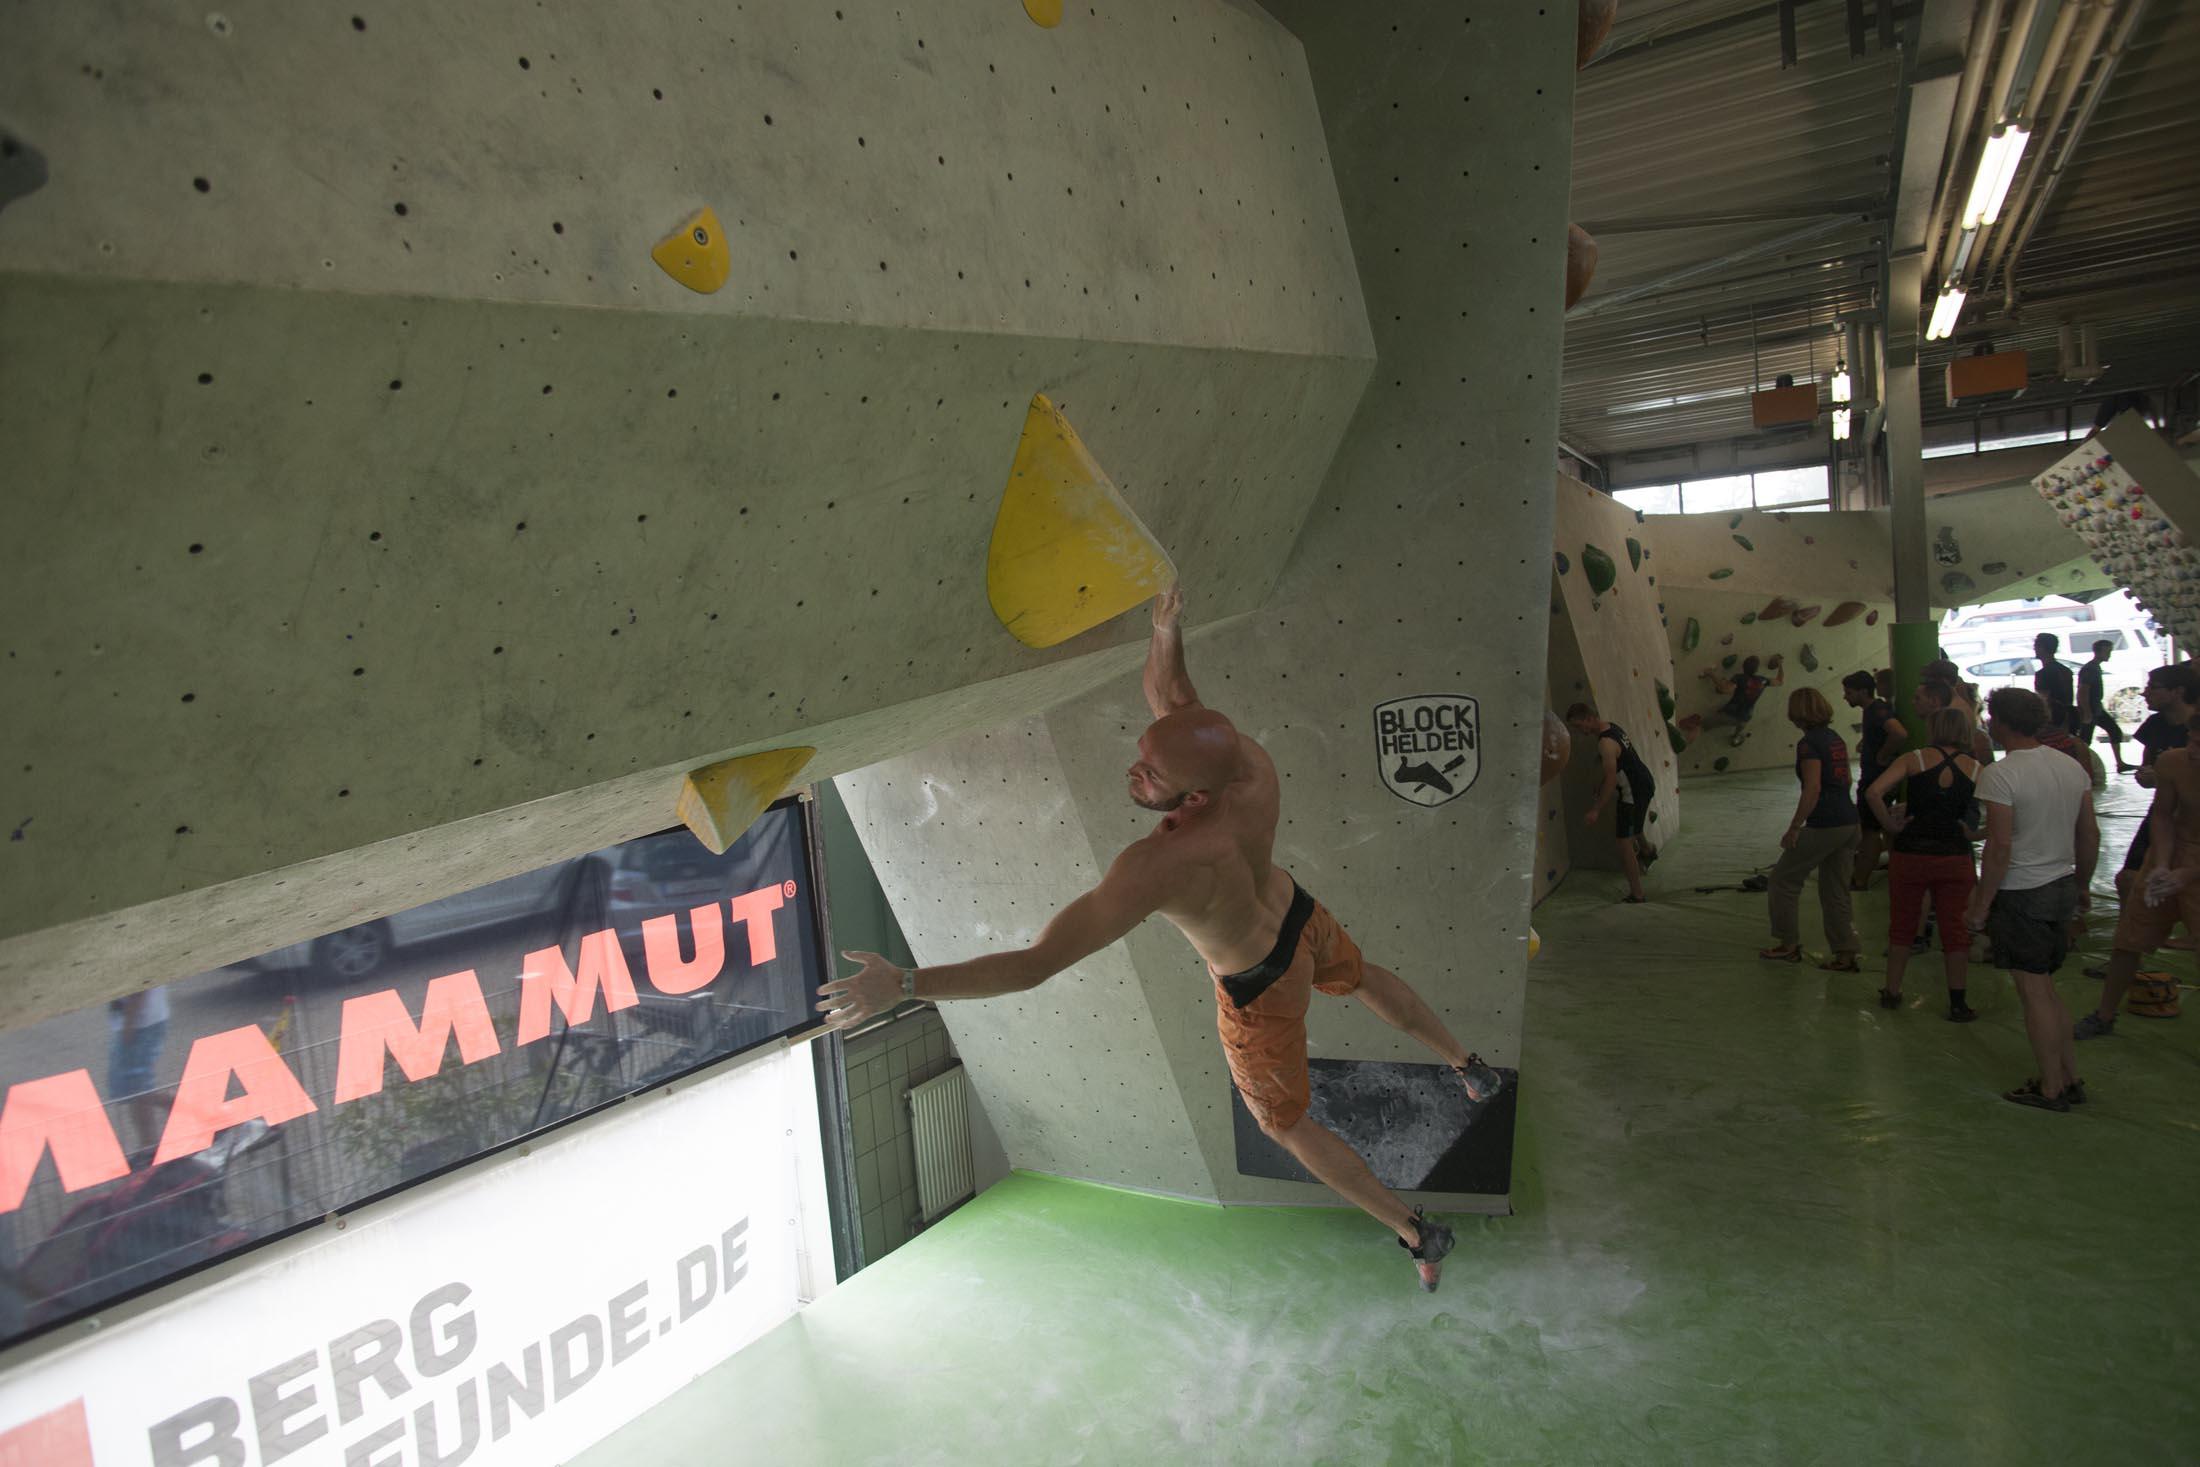 Quali, internationaler bouldercup Frankenjura 2016, BLOCKHELDEN Erlangen, Mammut, Bergfreunde.de, Boulderwettkampf07092016387